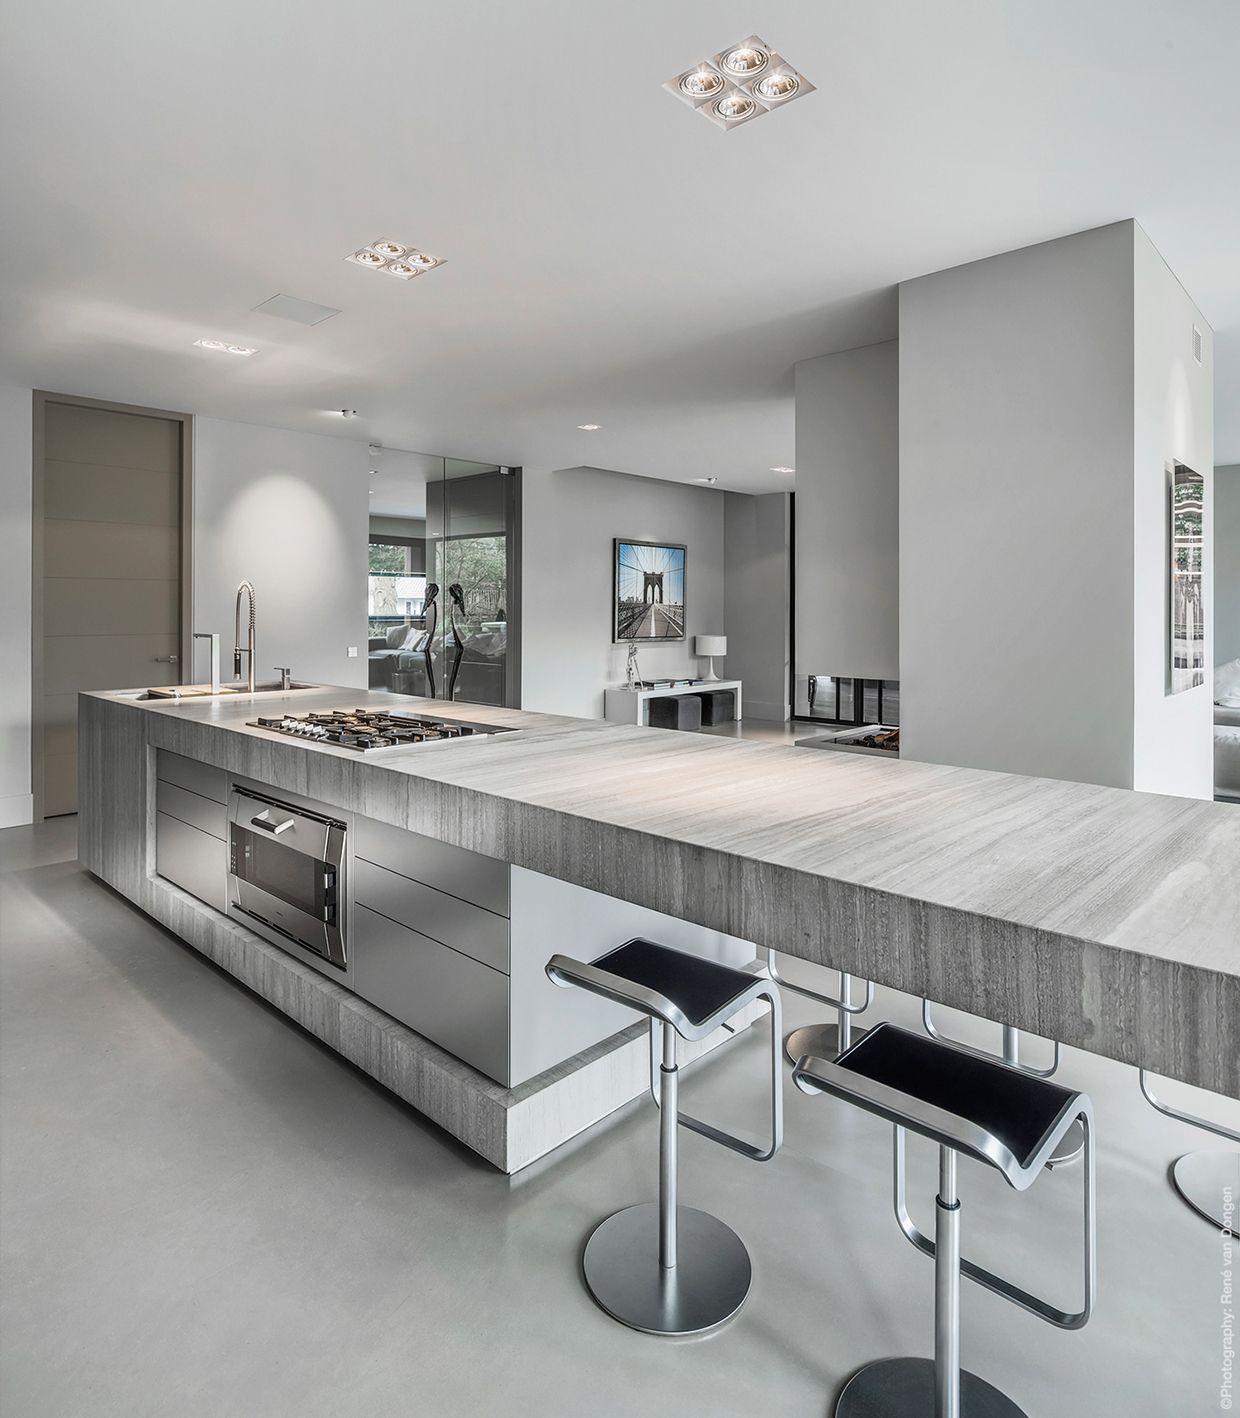 High End Kitchen Design C76914A4870659E455847D94Eedd4176 1240×1418  Kitchen Ideas